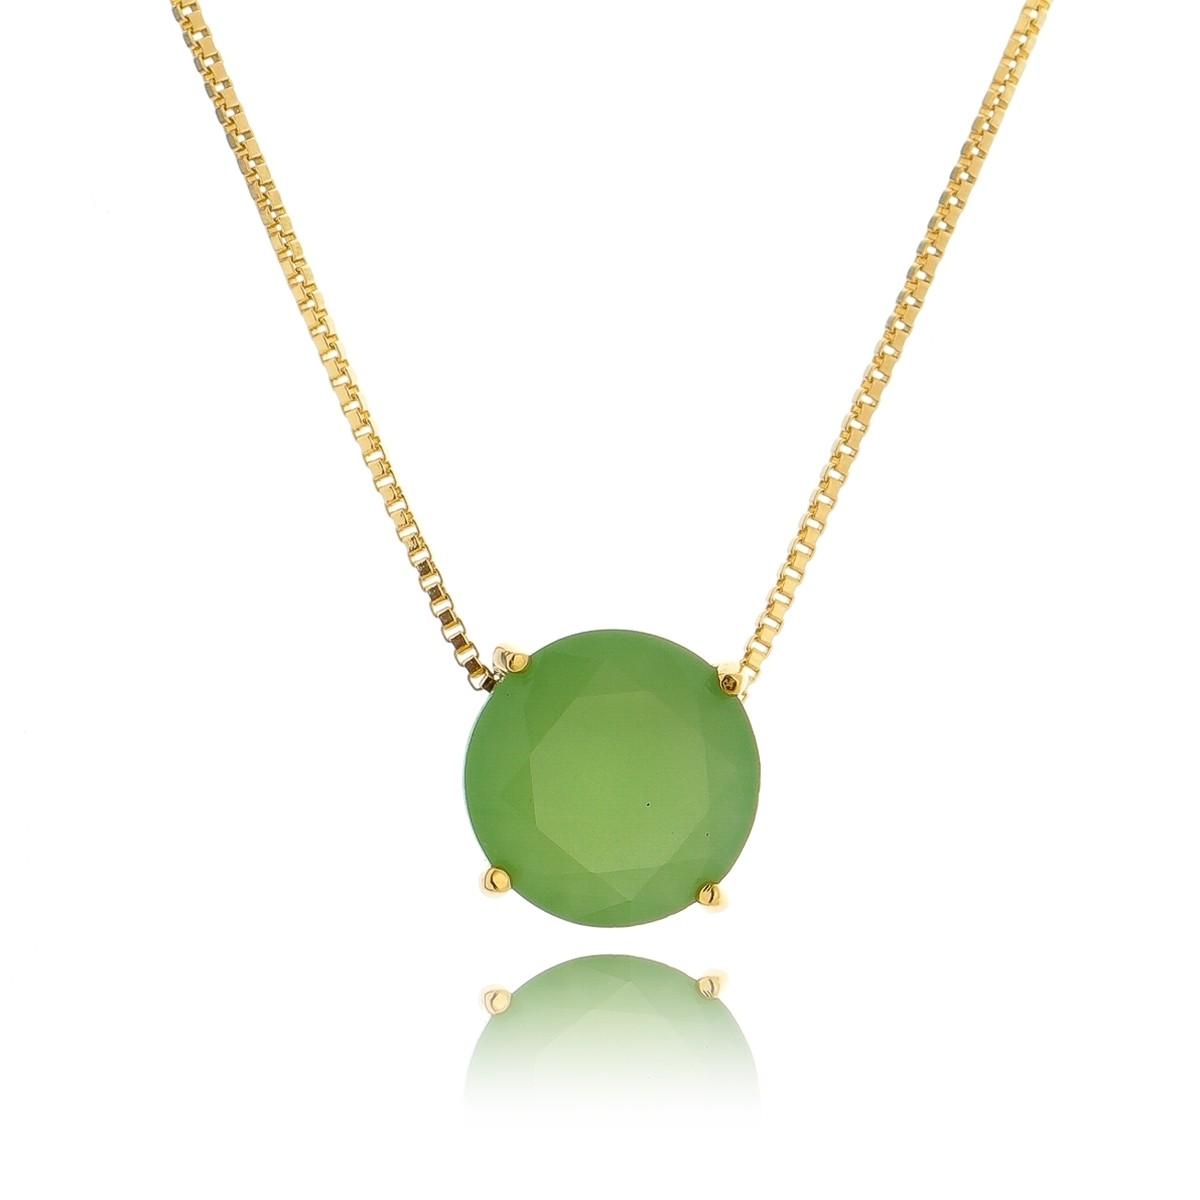 Colar Pingente Redondo Verde Semijoia em Ouro 18K  - Soloyou